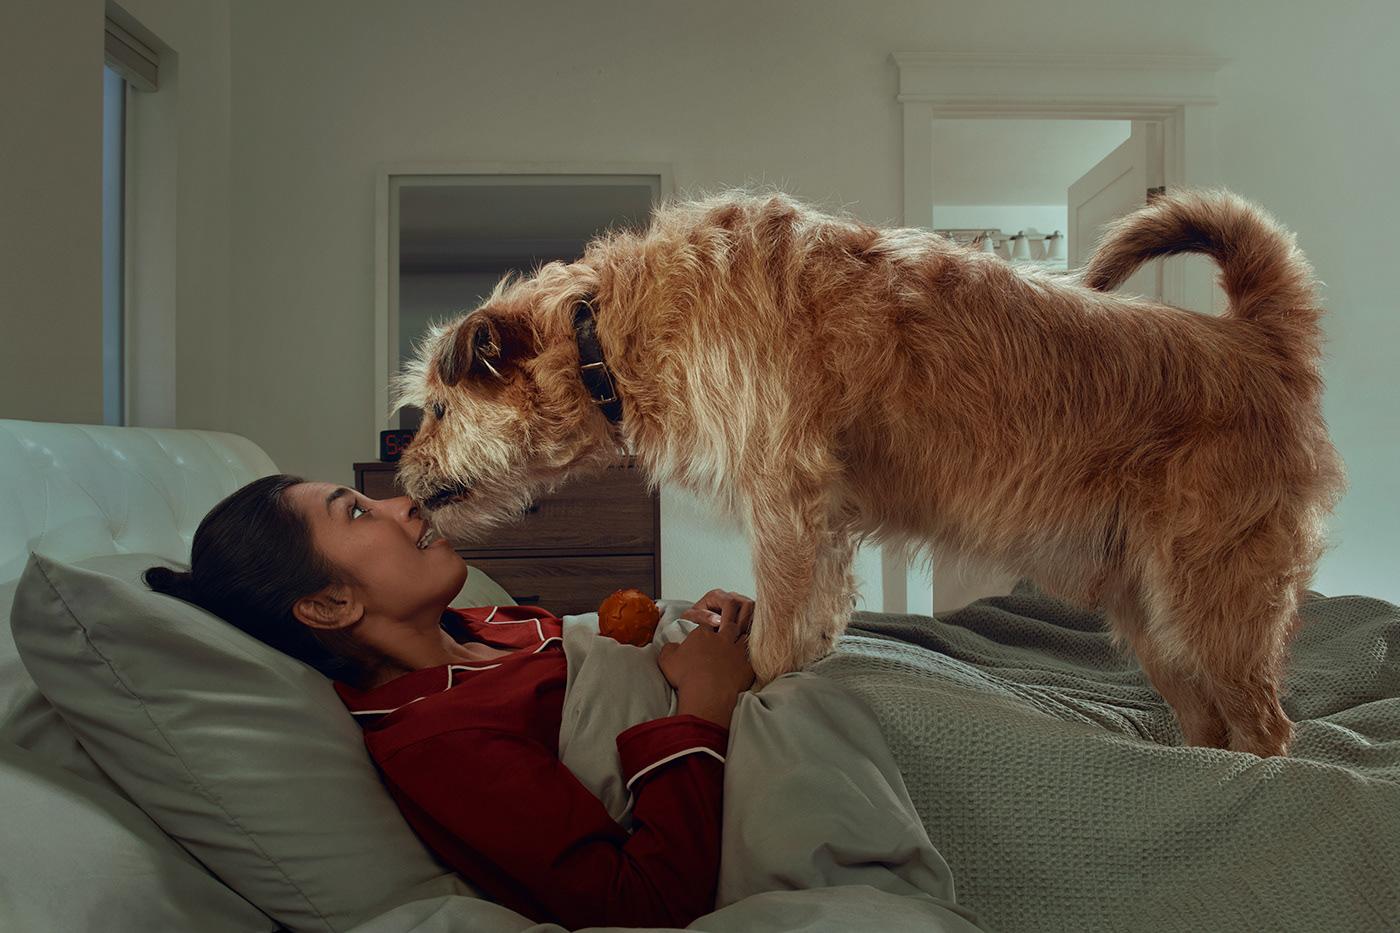 animals calm campaign shoot CBD dogs Health mansbestfriend medication pets veterinary